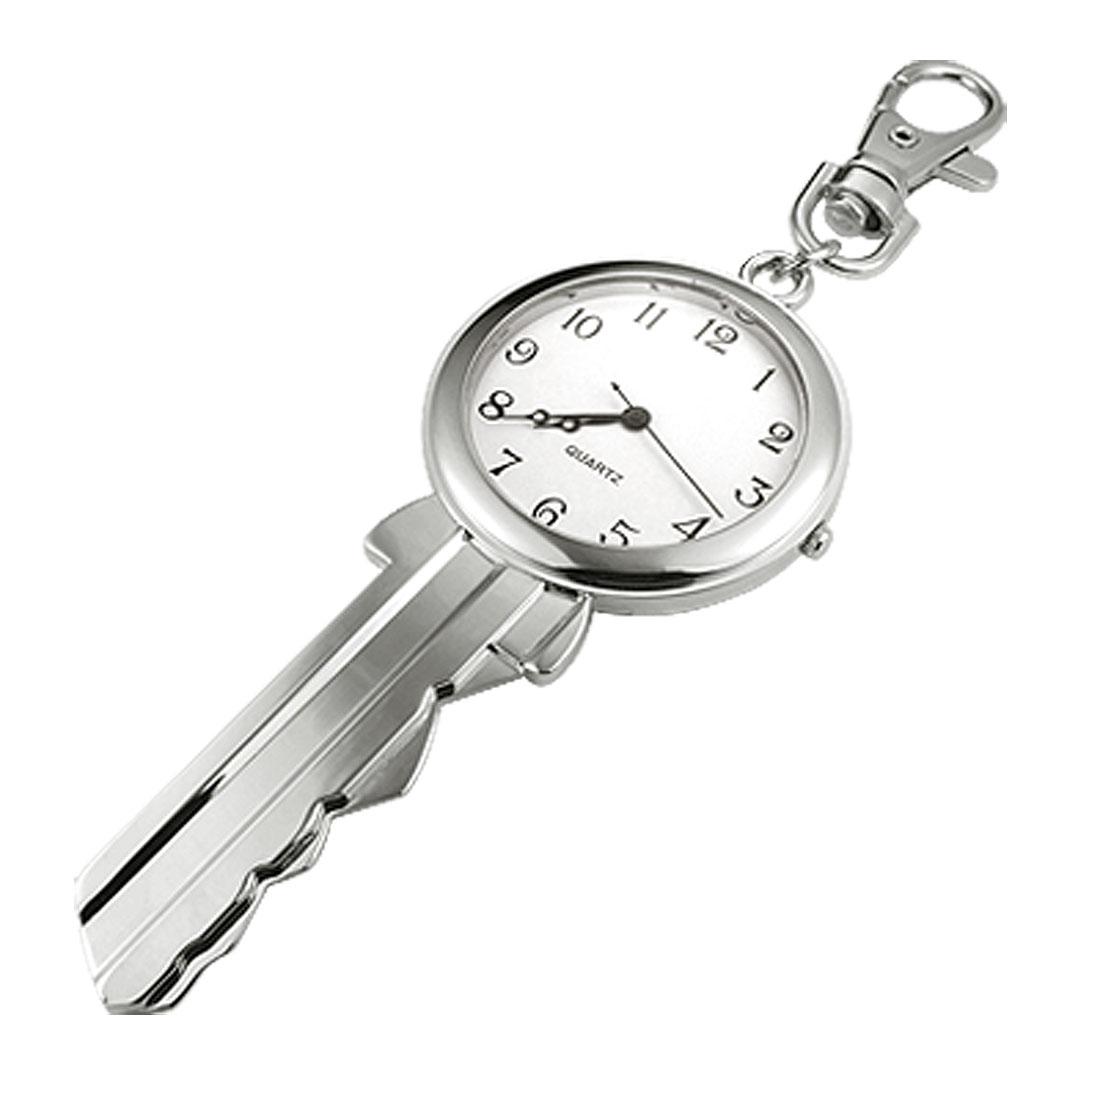 Unique Big Key Shaped Key Chain Clip Watch